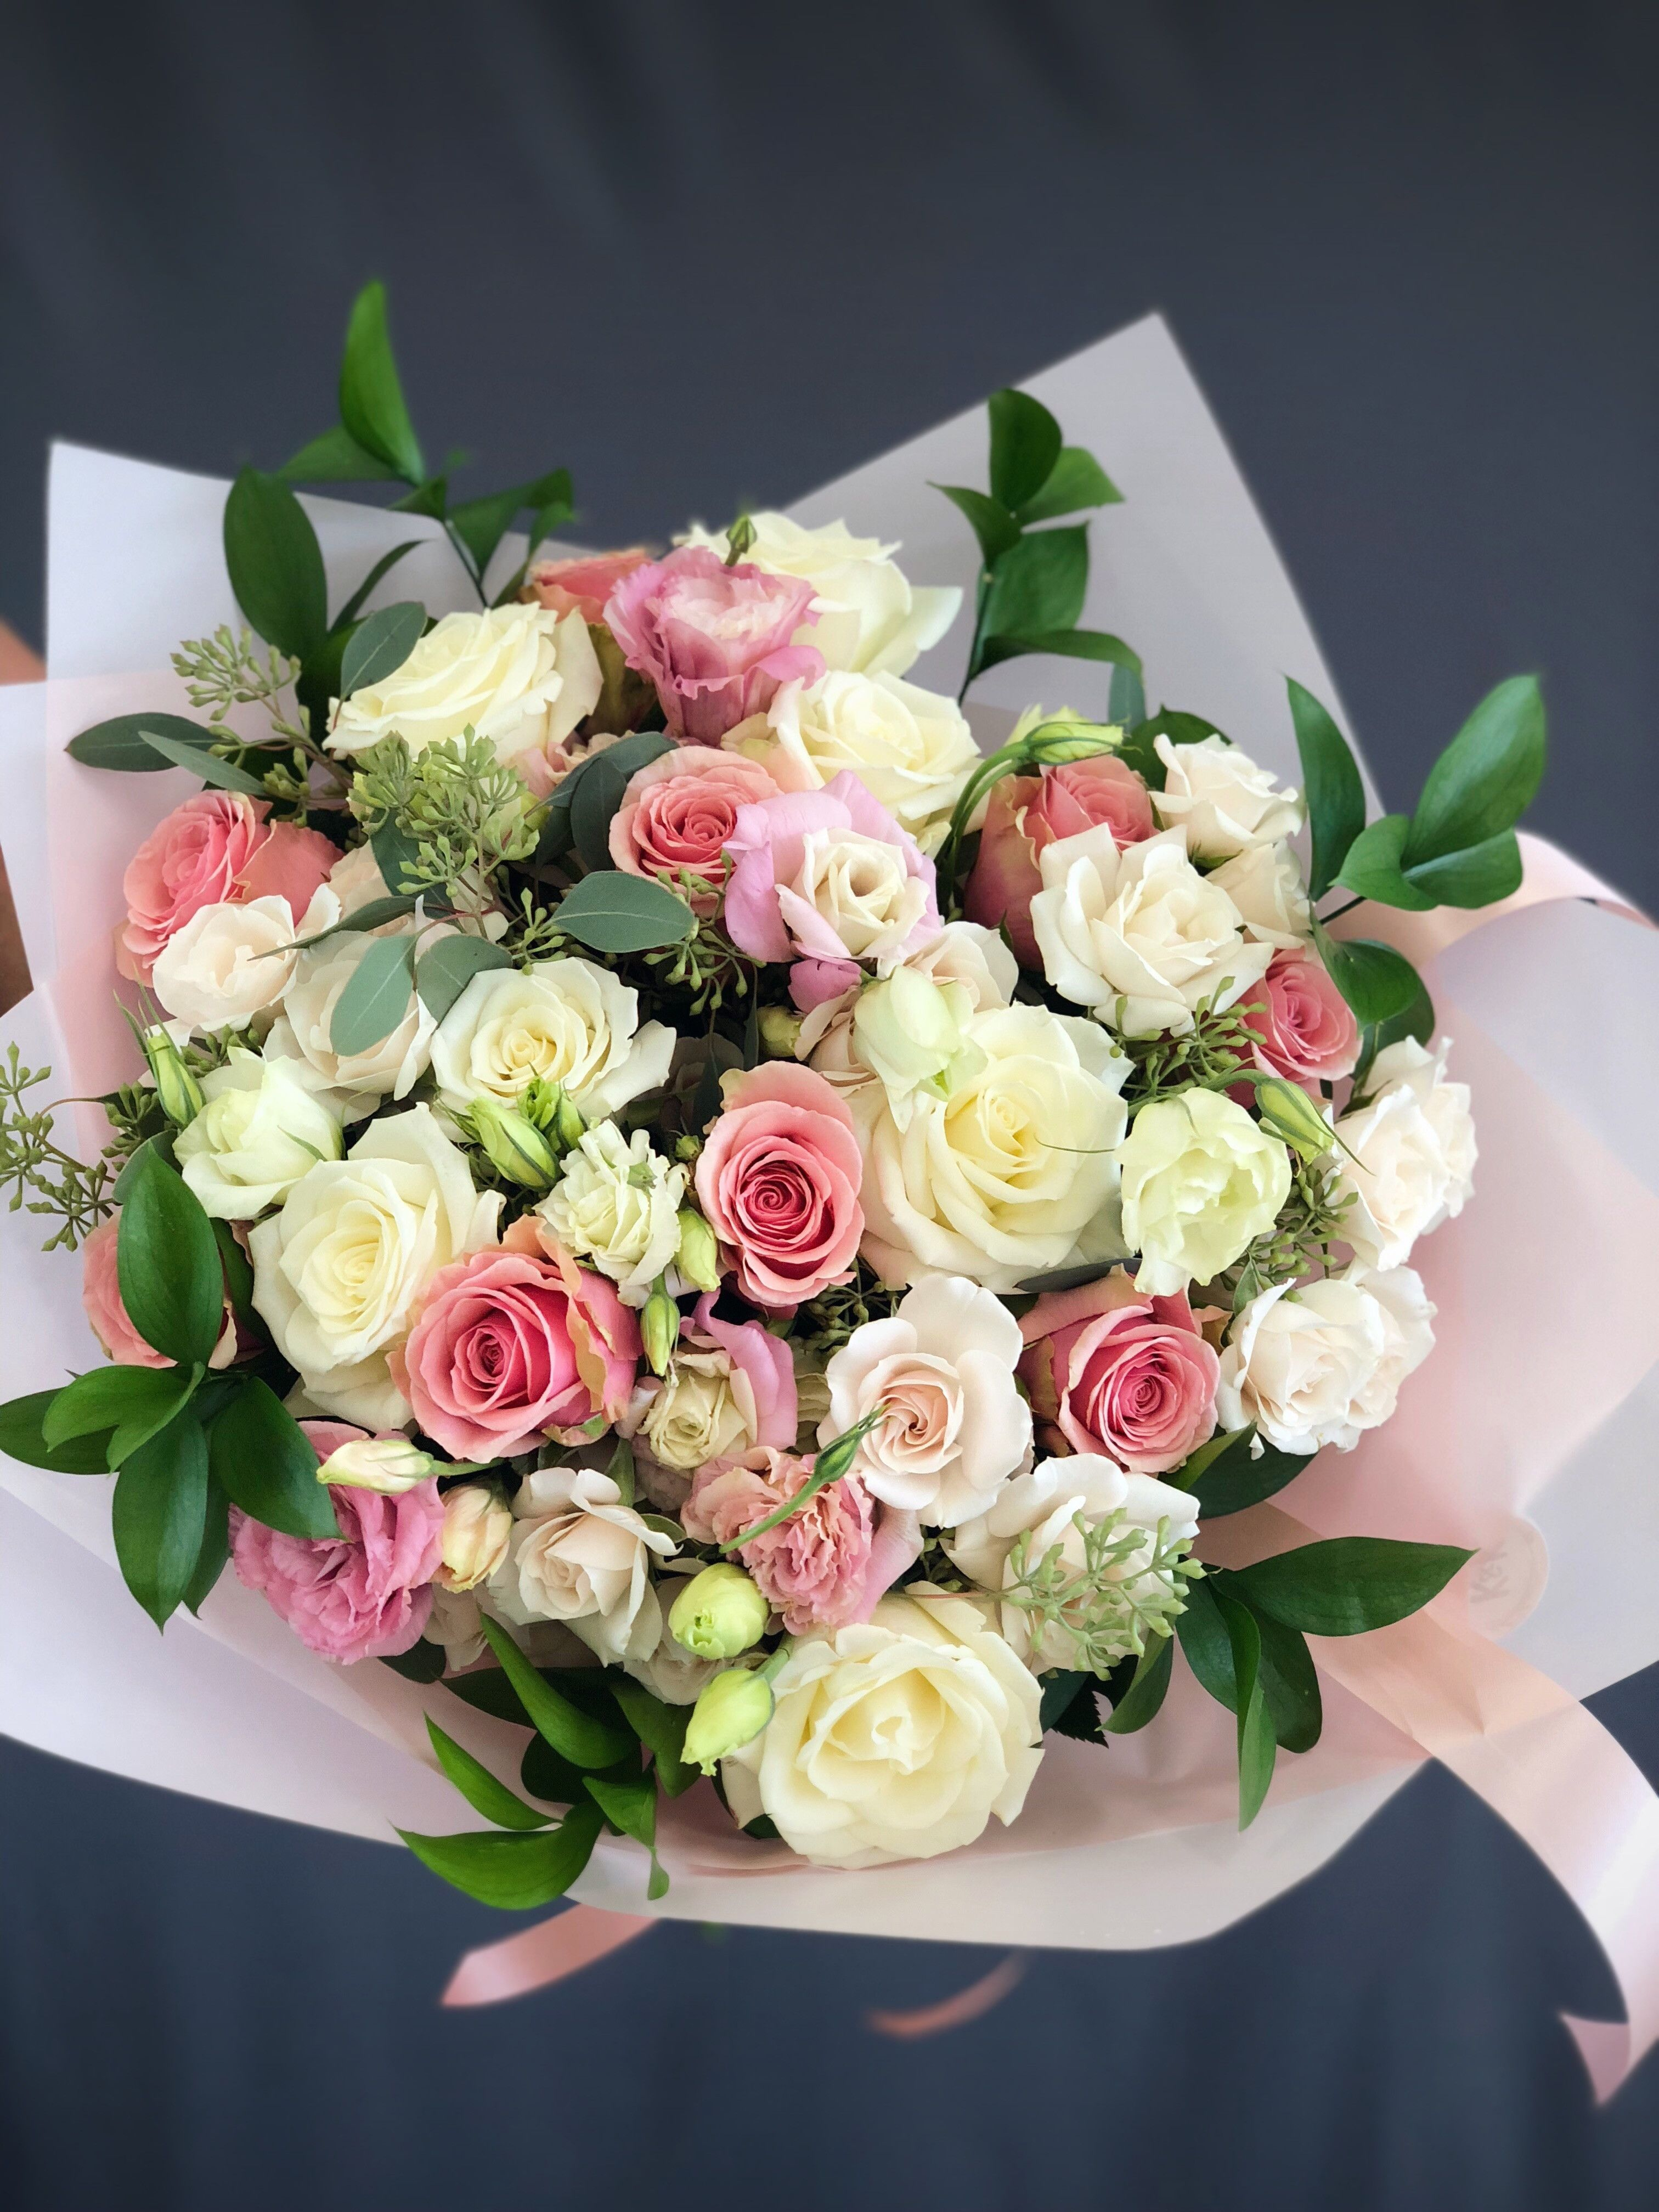 29 Bouquet Pink White Large In Hallandale Beach Fl K K